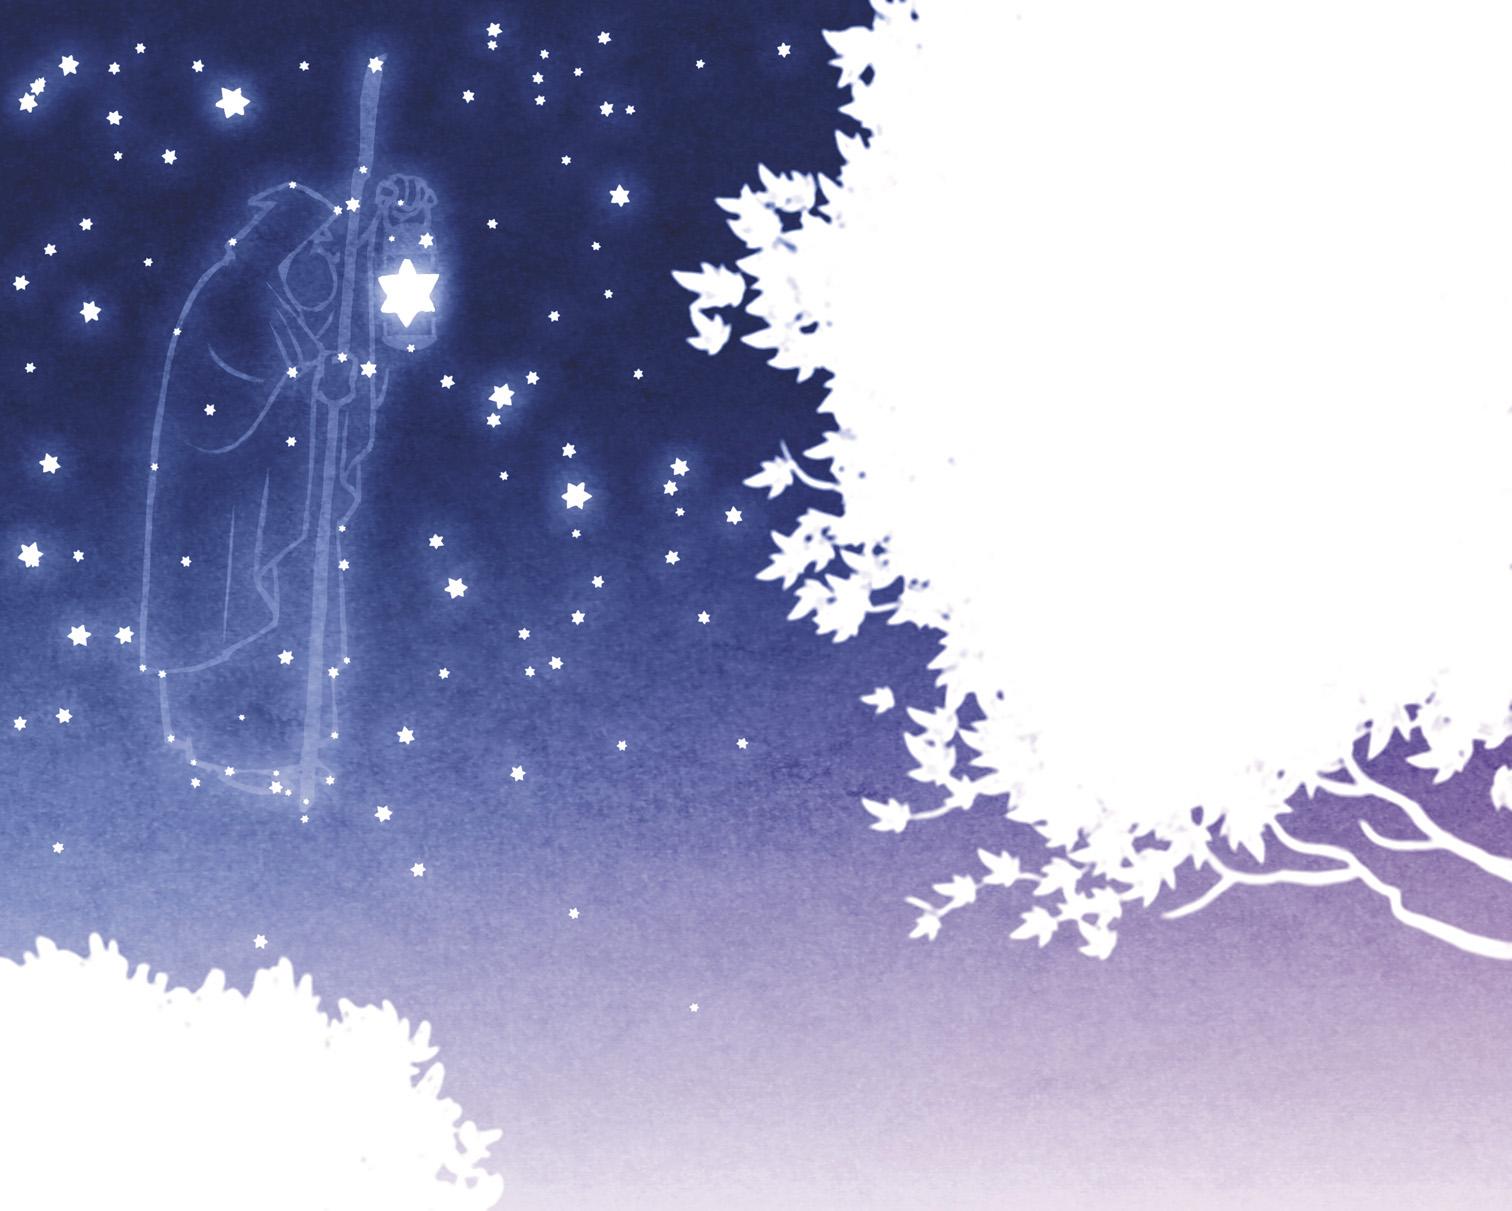 05_estrelas.jpg